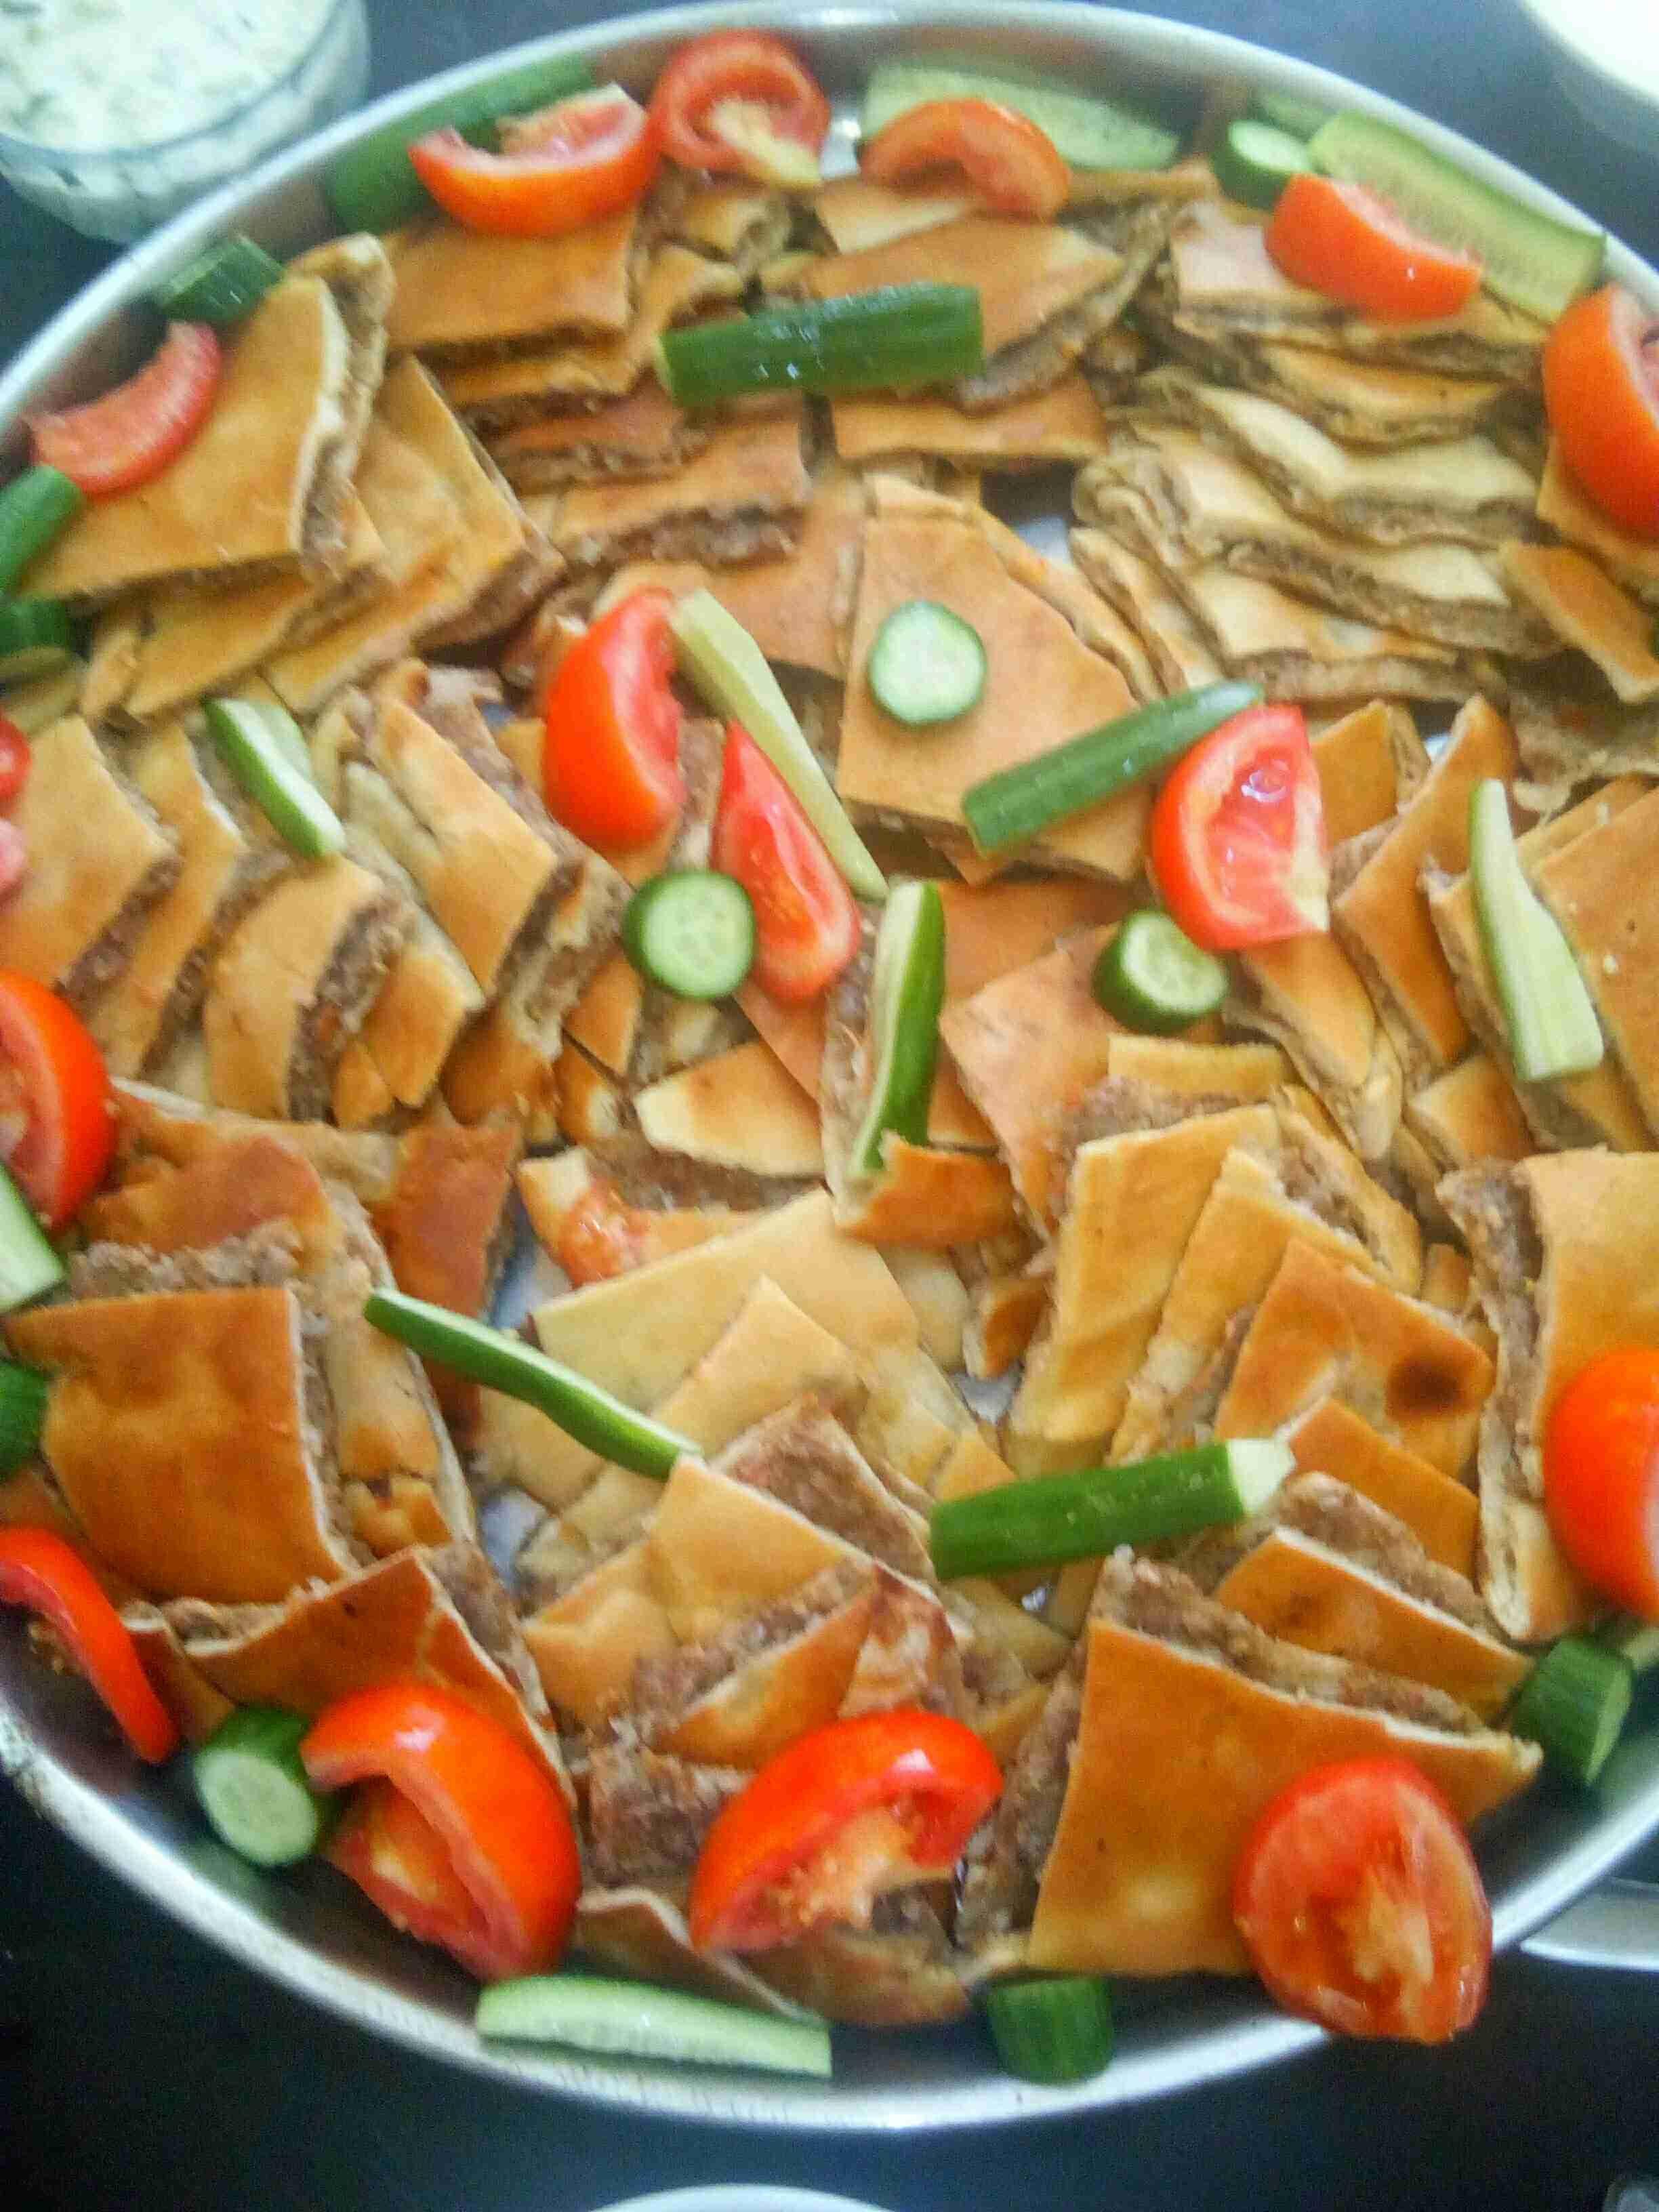 القرص الطريه باللبن الرايب كتيييييييييييير بتشهي و طعمها رووووعة زاكي Syrian Food Cooking Recipes Desserts Food Recipies